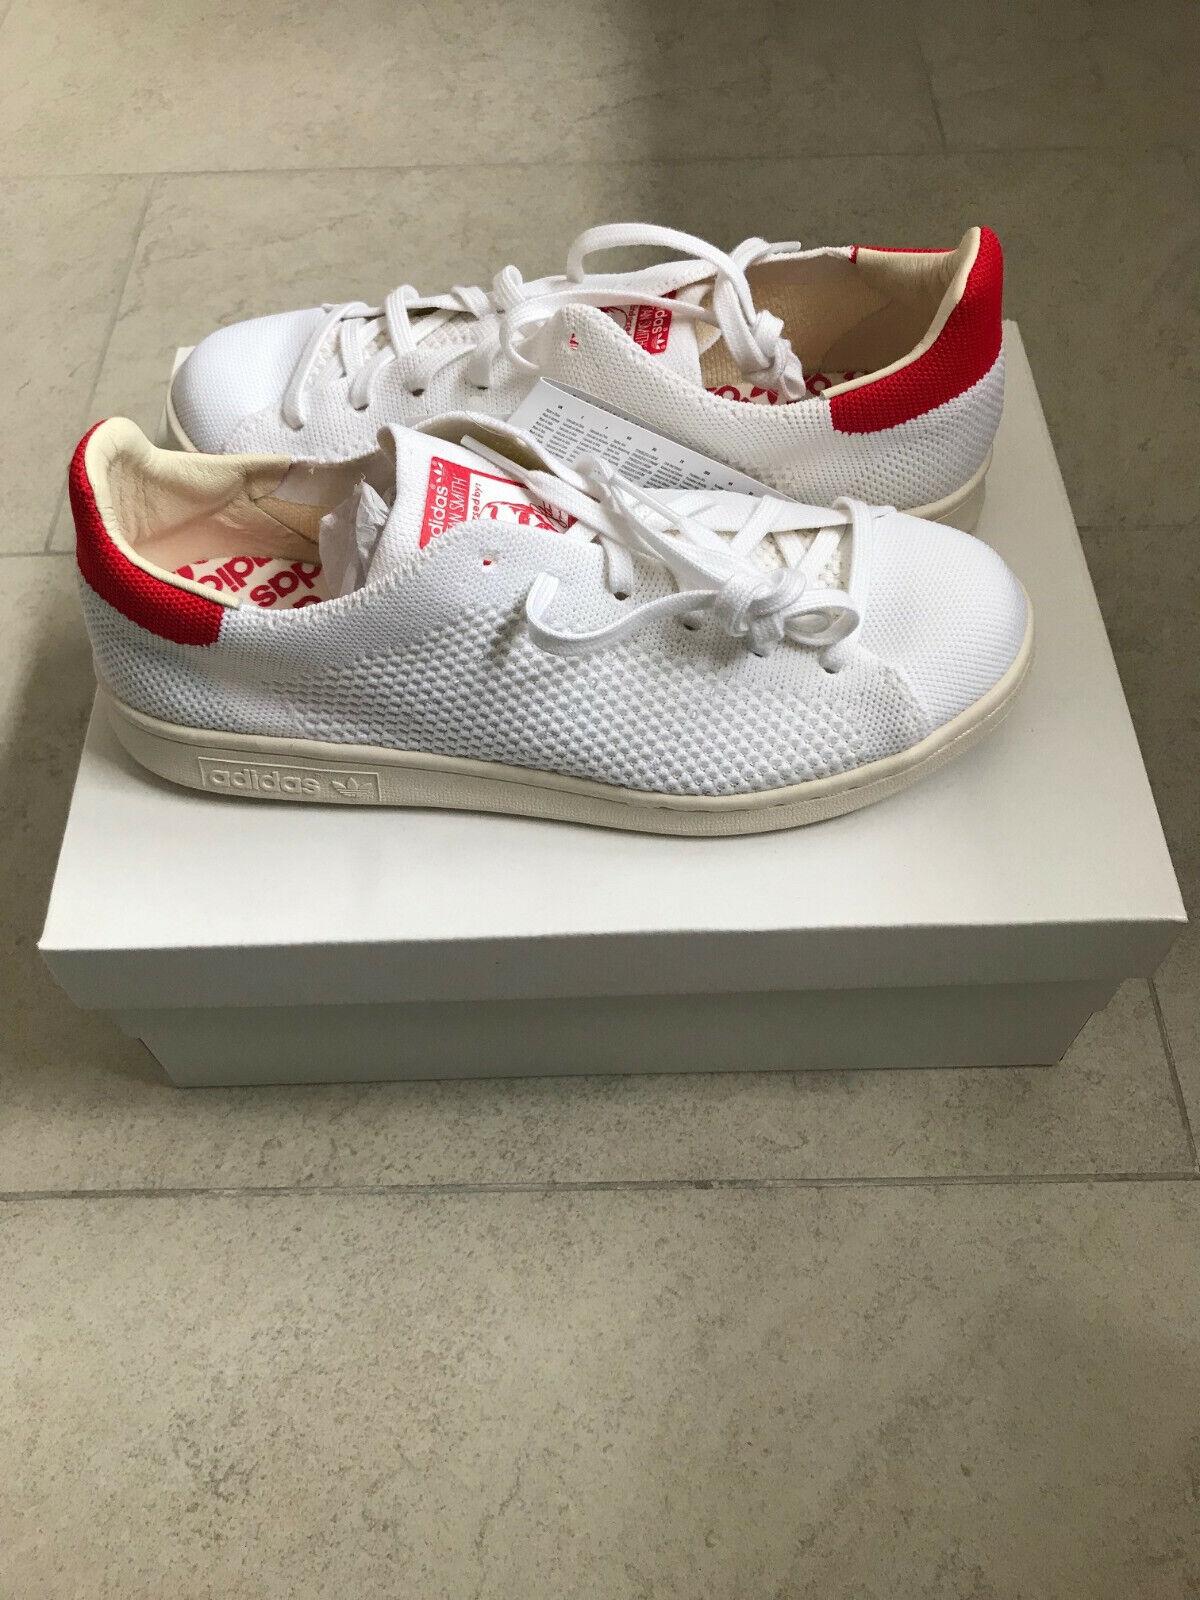 Adidas Stan Smith OG Primeknit S75147 Herren Schuhe Sneaker versch. Größen